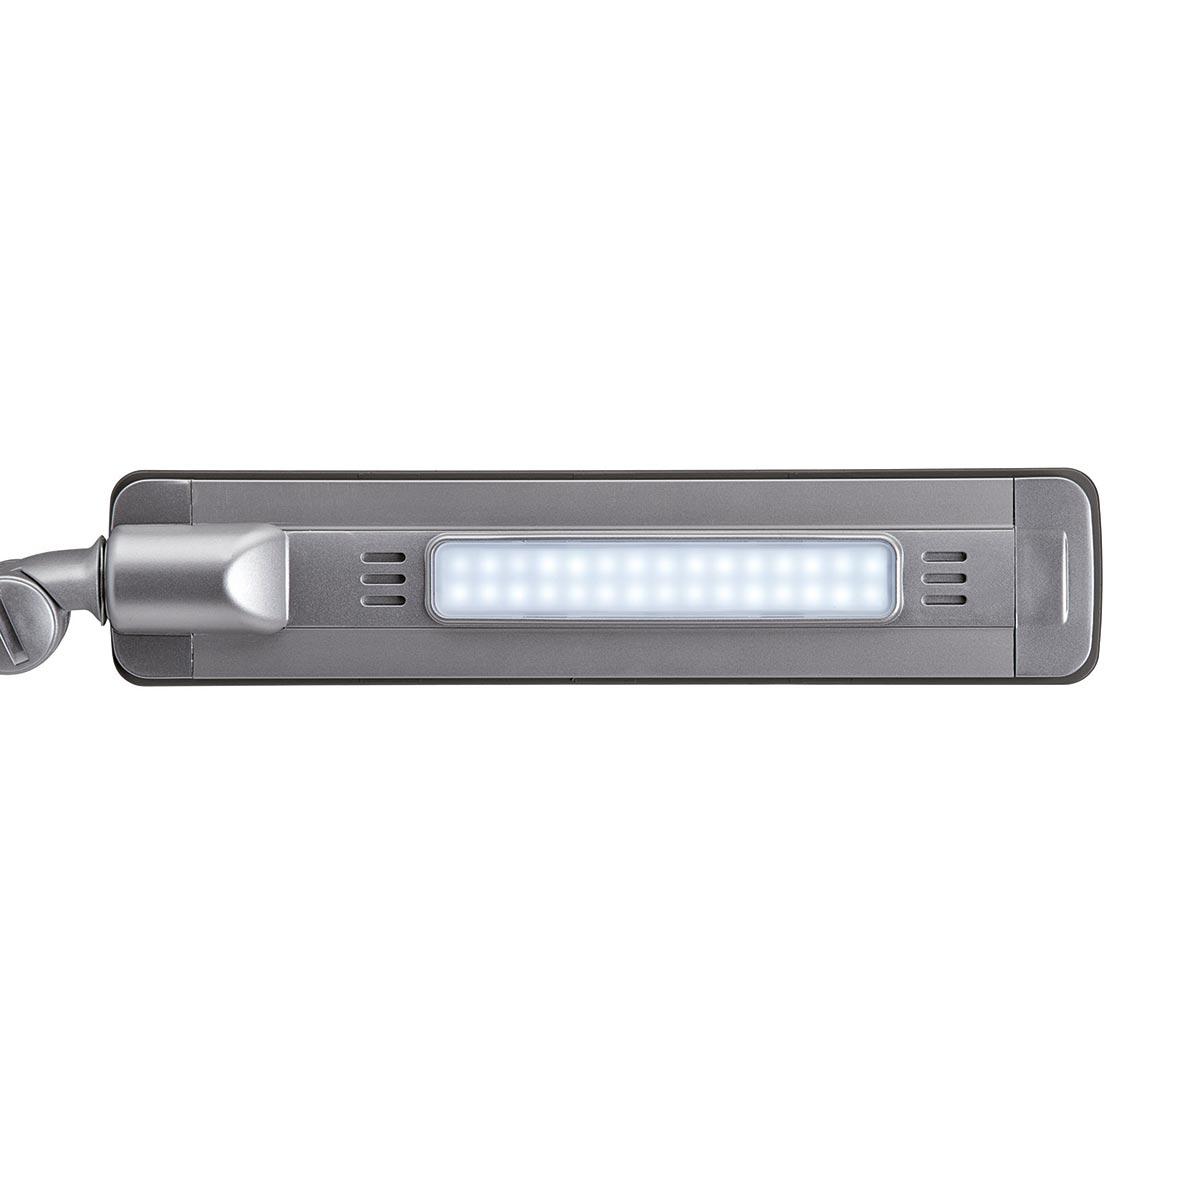 led schreibtischlampe maulpure silber 8w 430lm tageslicht dimmbar. Black Bedroom Furniture Sets. Home Design Ideas